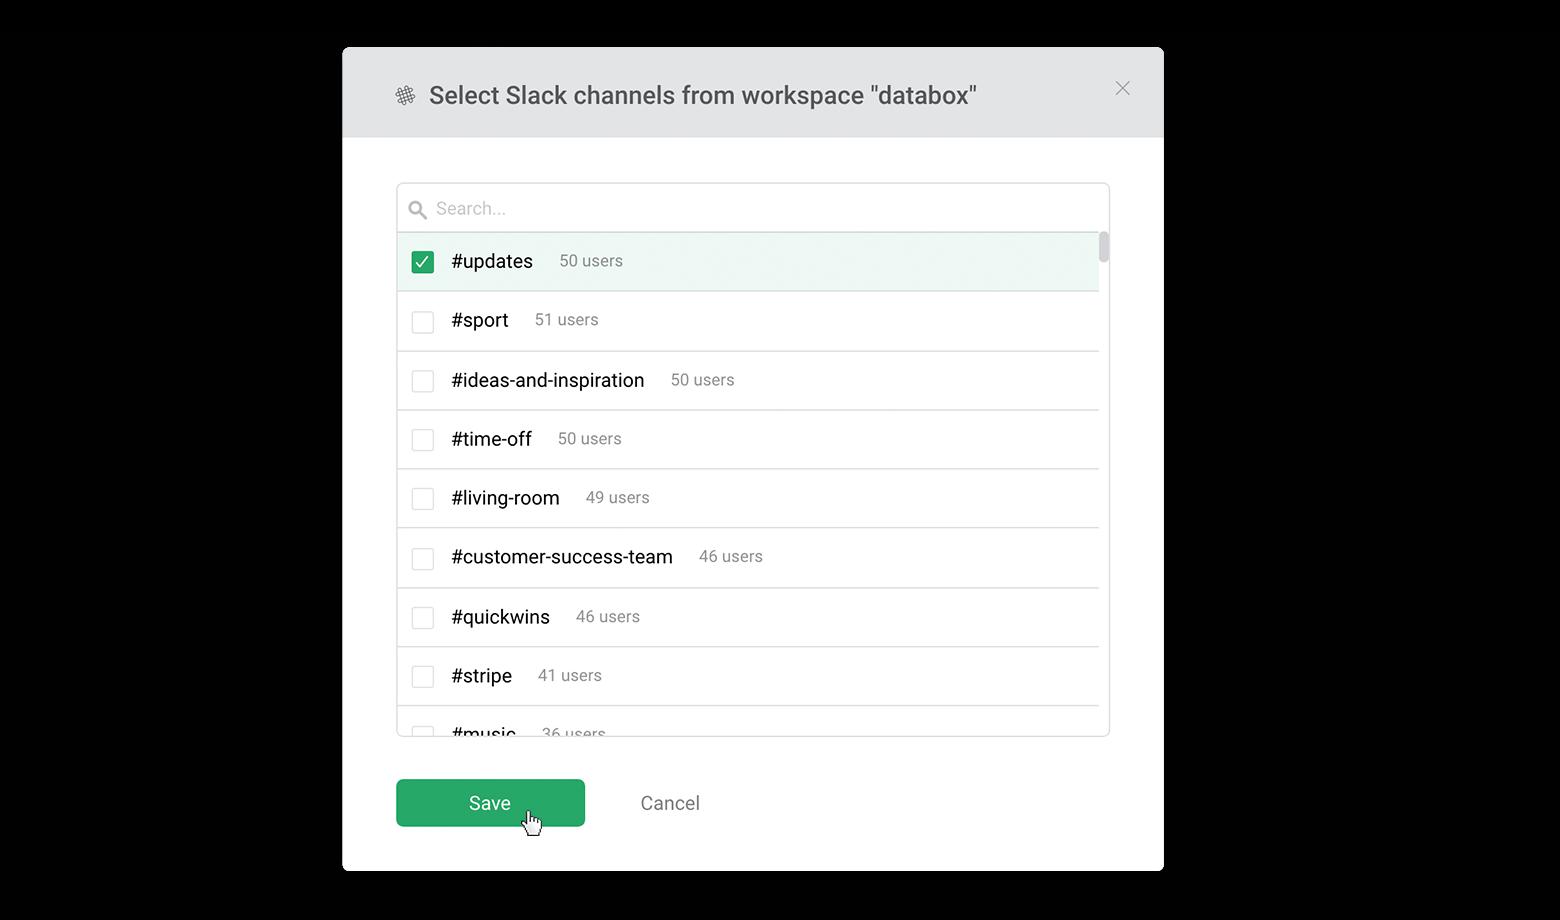 Choose the Slack channel(s)